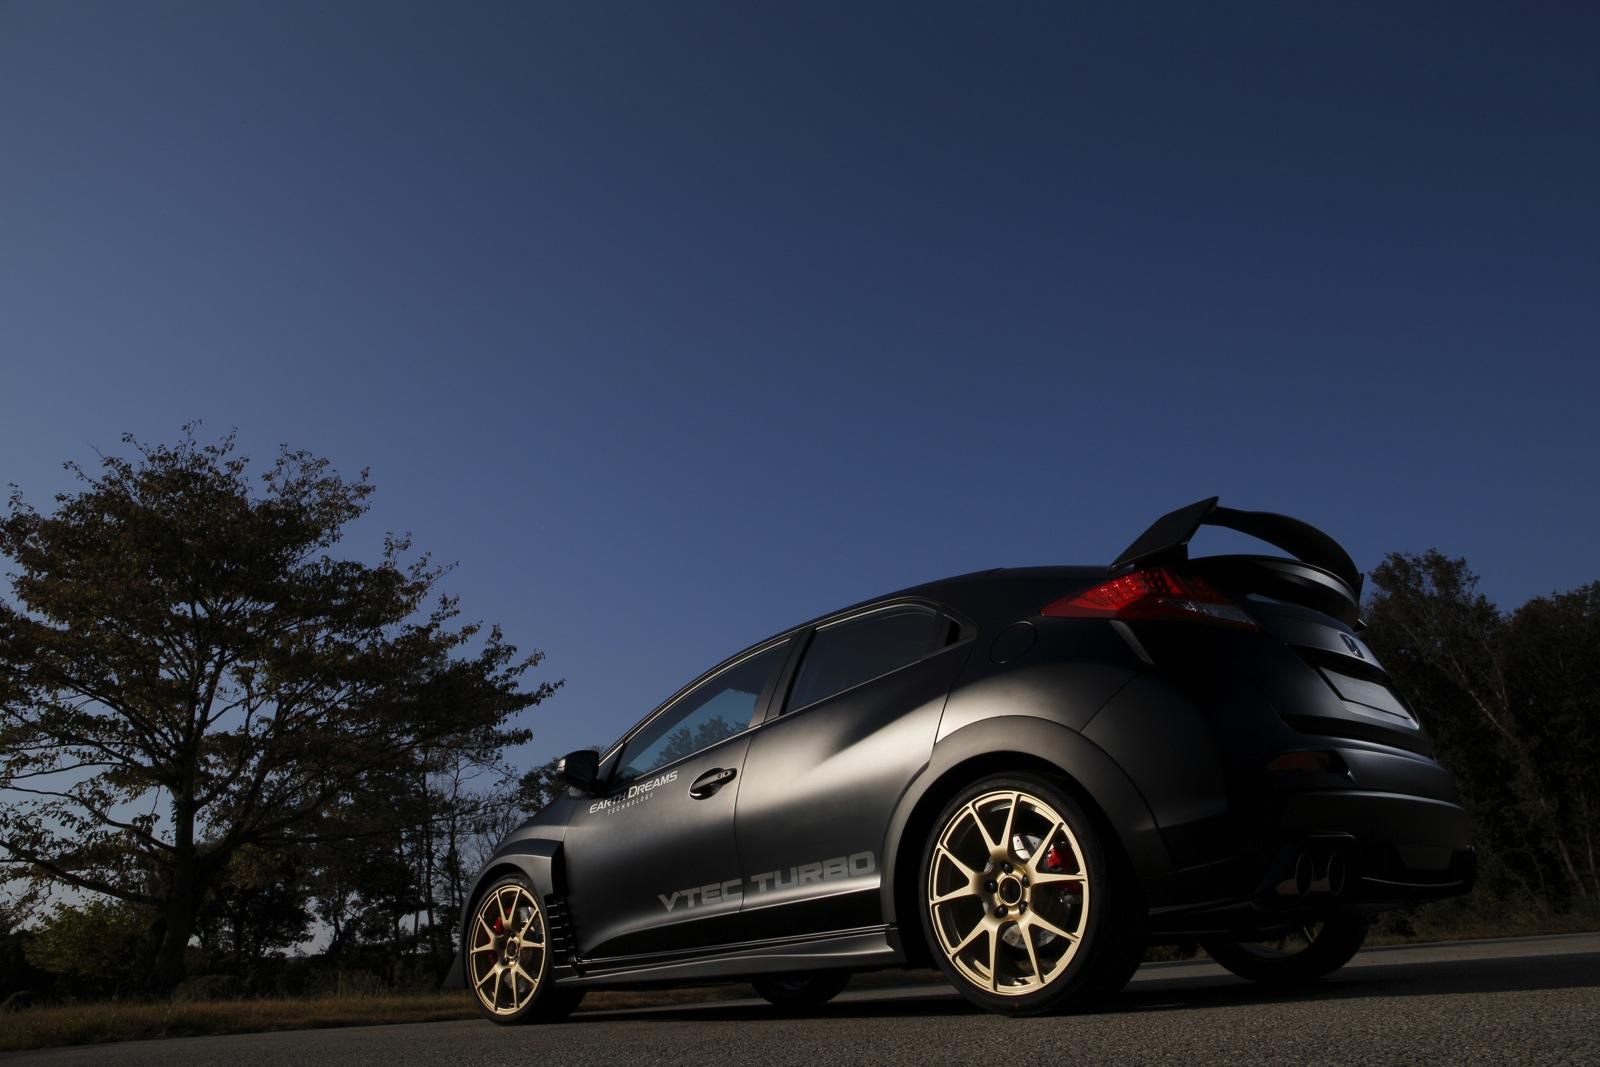 2015 Honda Civic Type R Review: Prototype drive - photos | CarAdvice